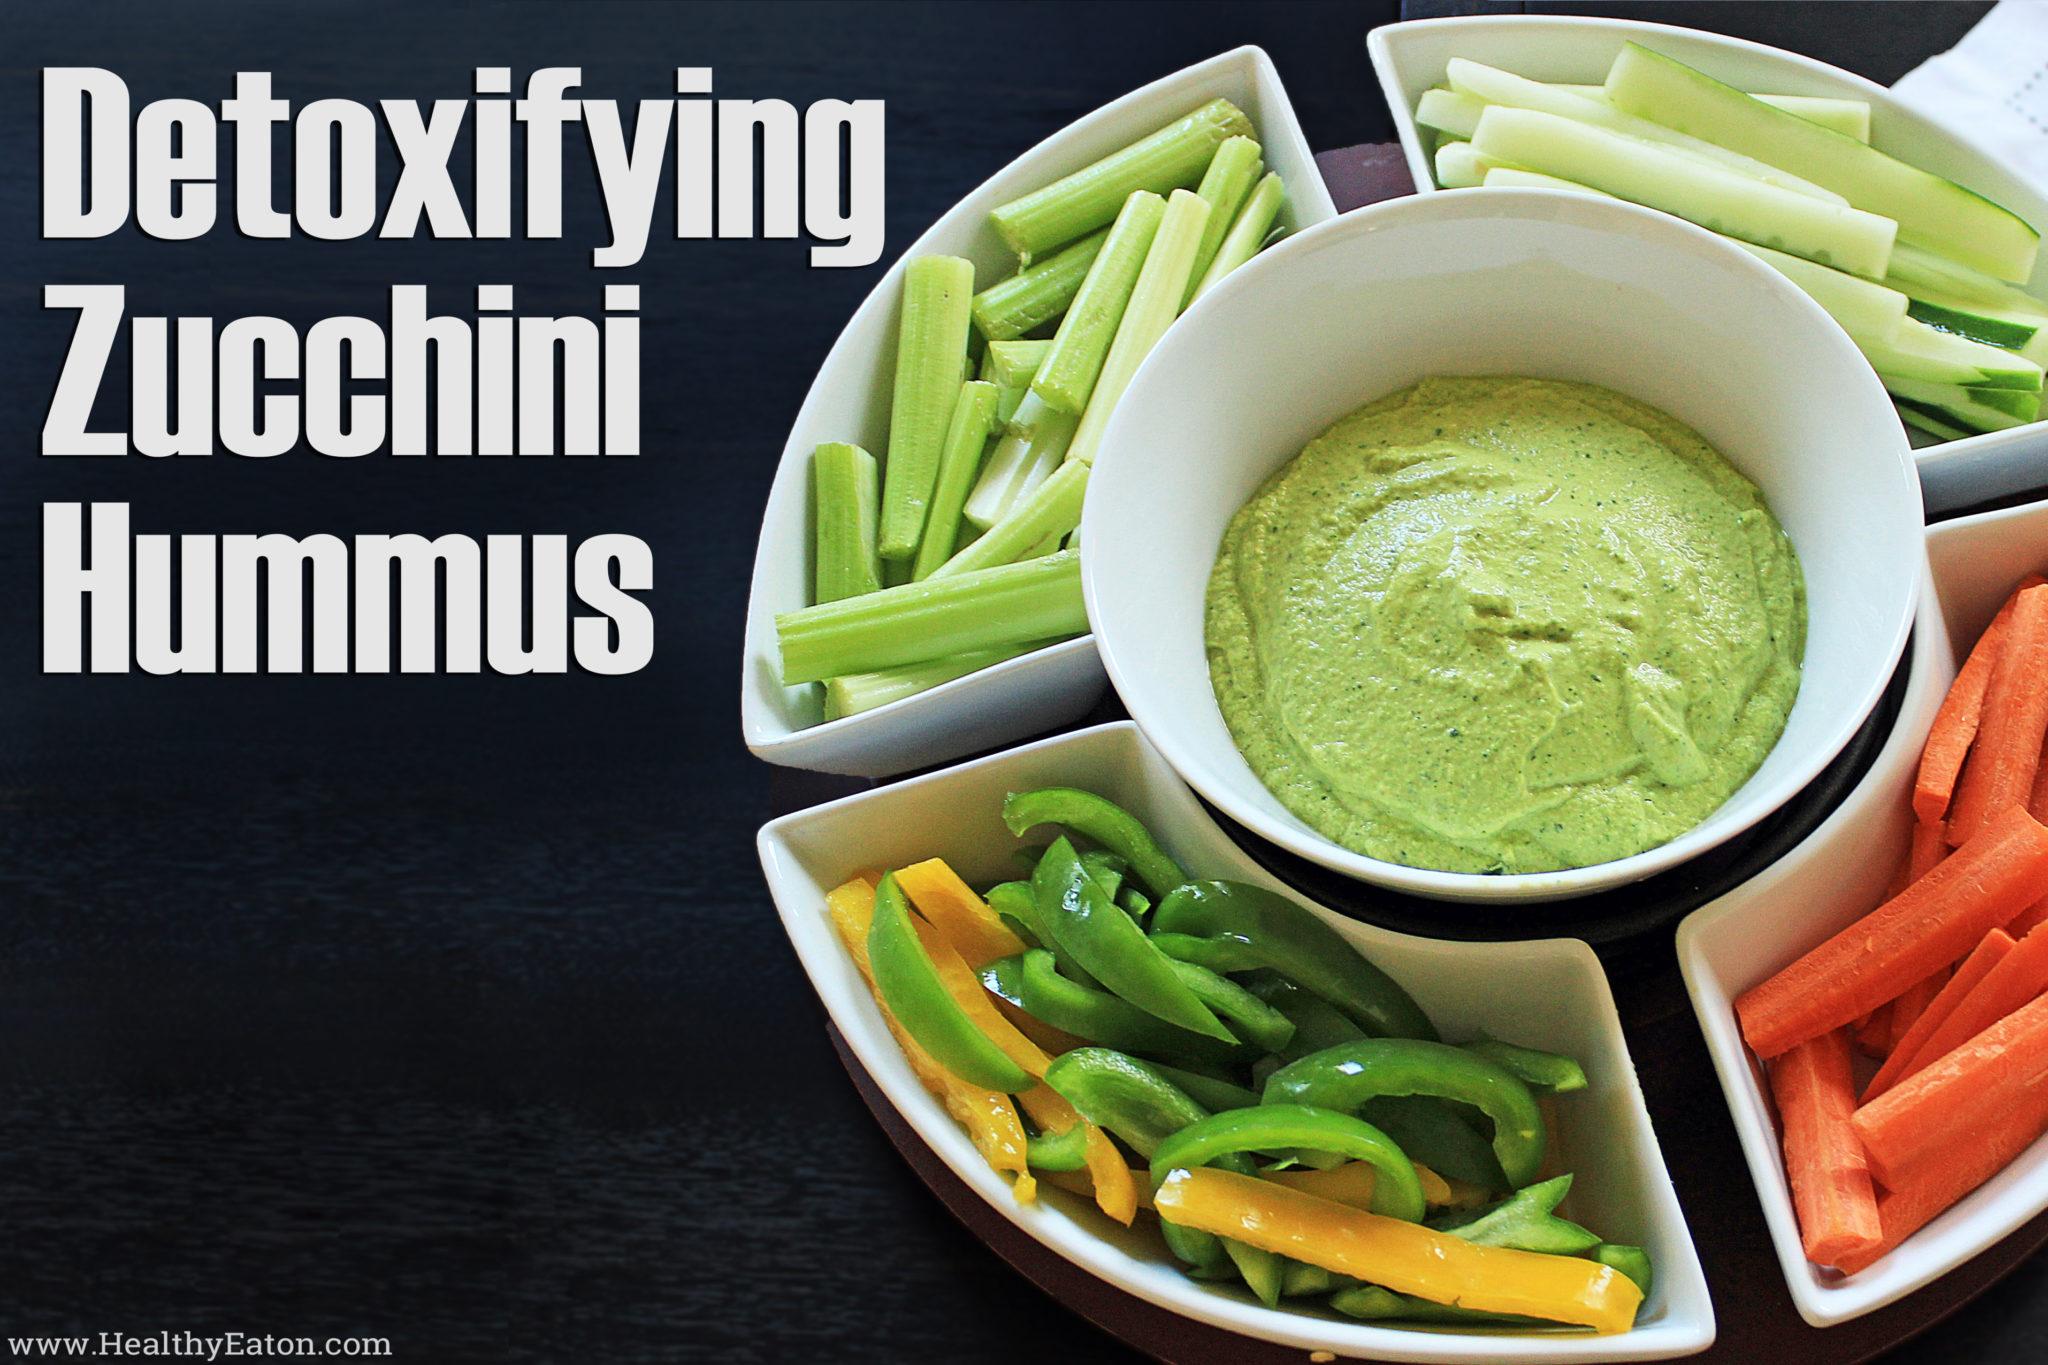 Recipe: Detoxifying Zucchini Hummus